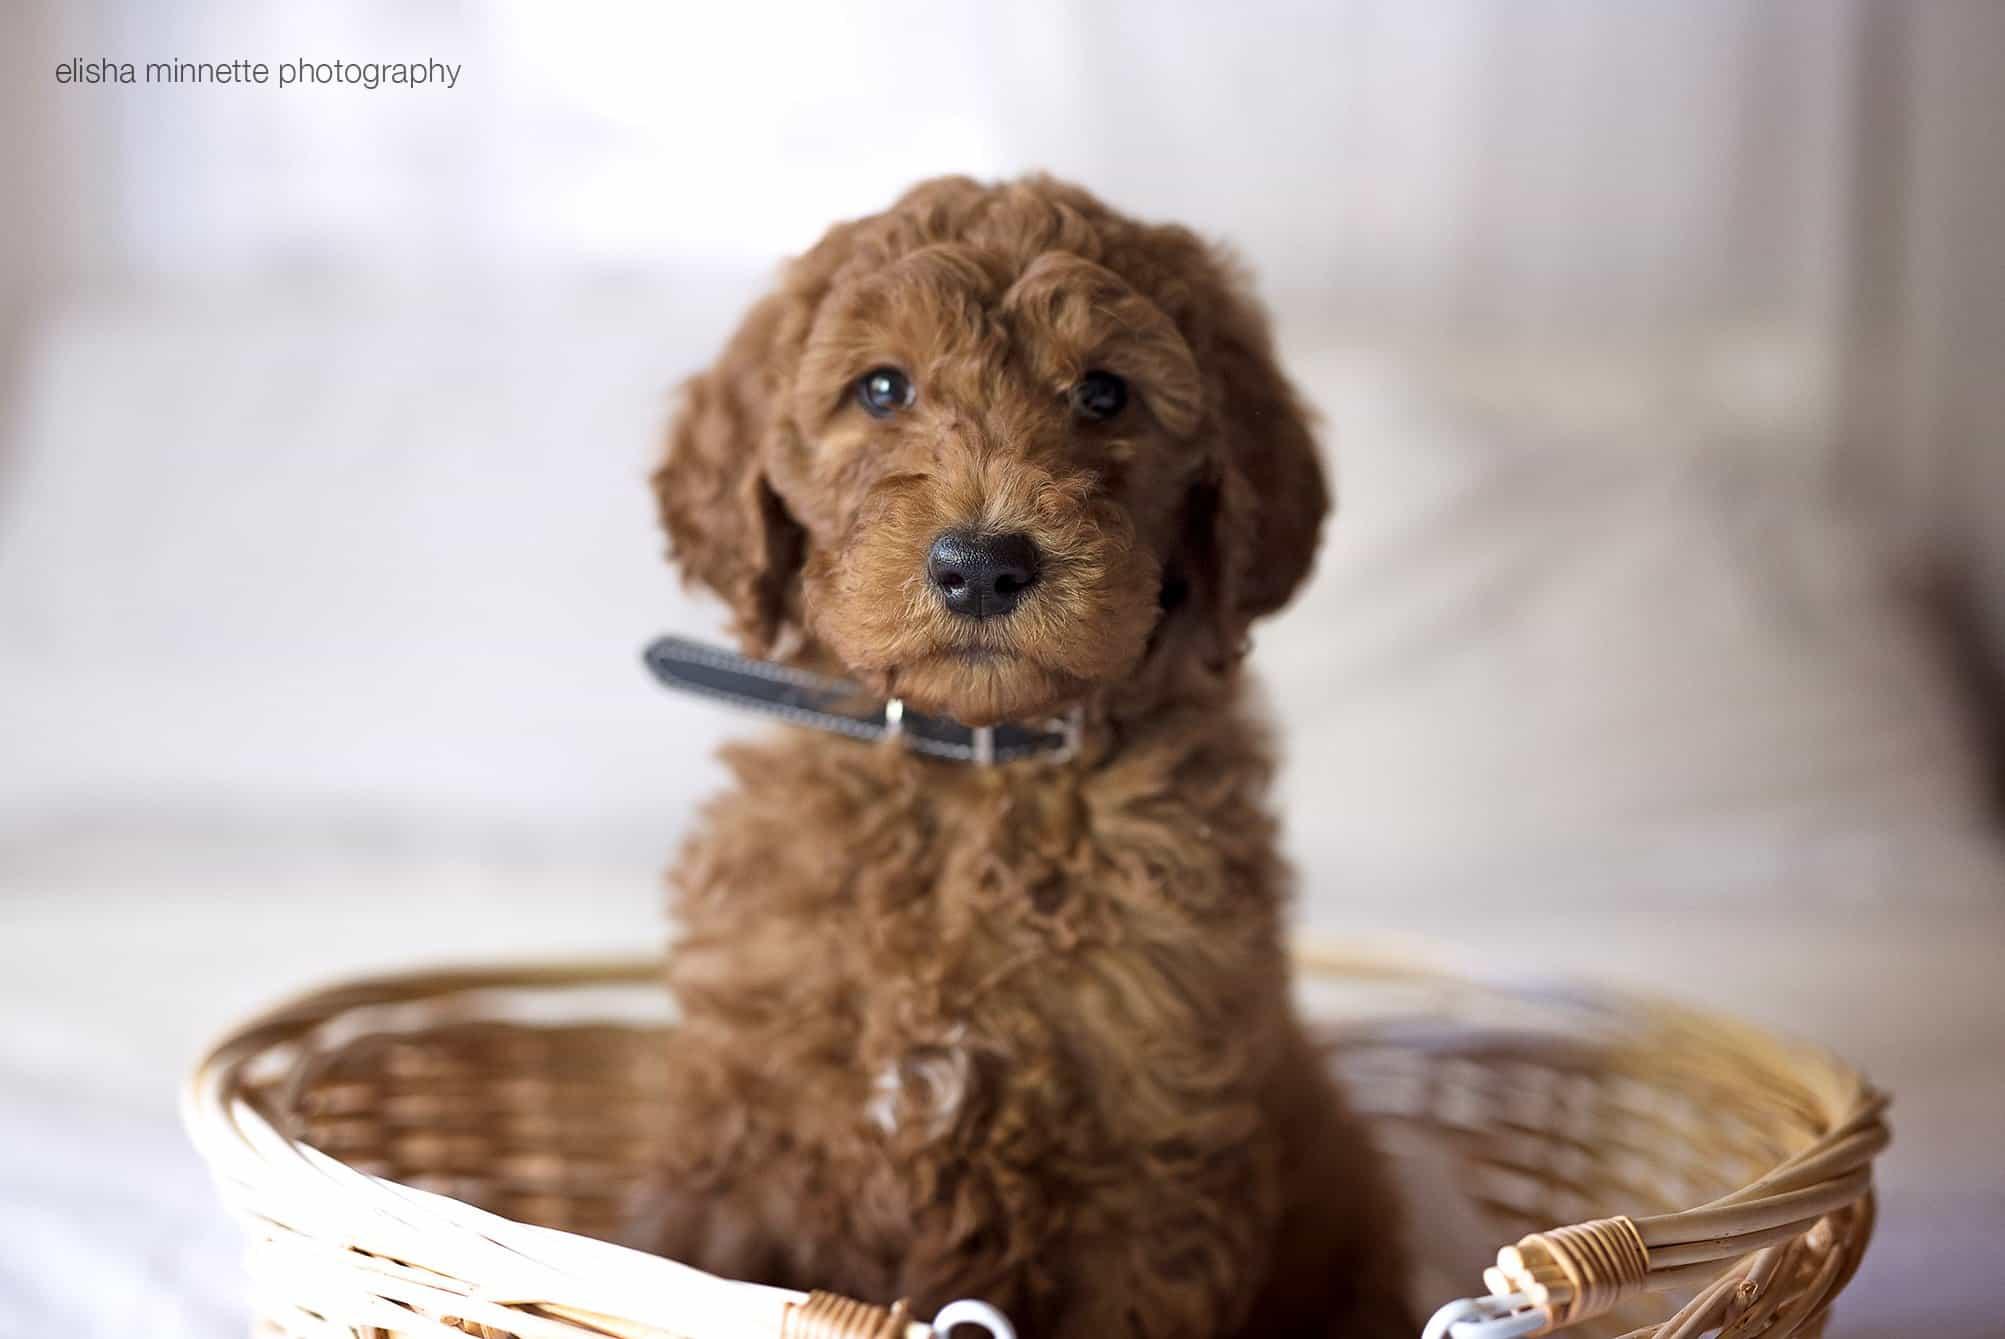 elisha-minnette-newborn-puppy-7